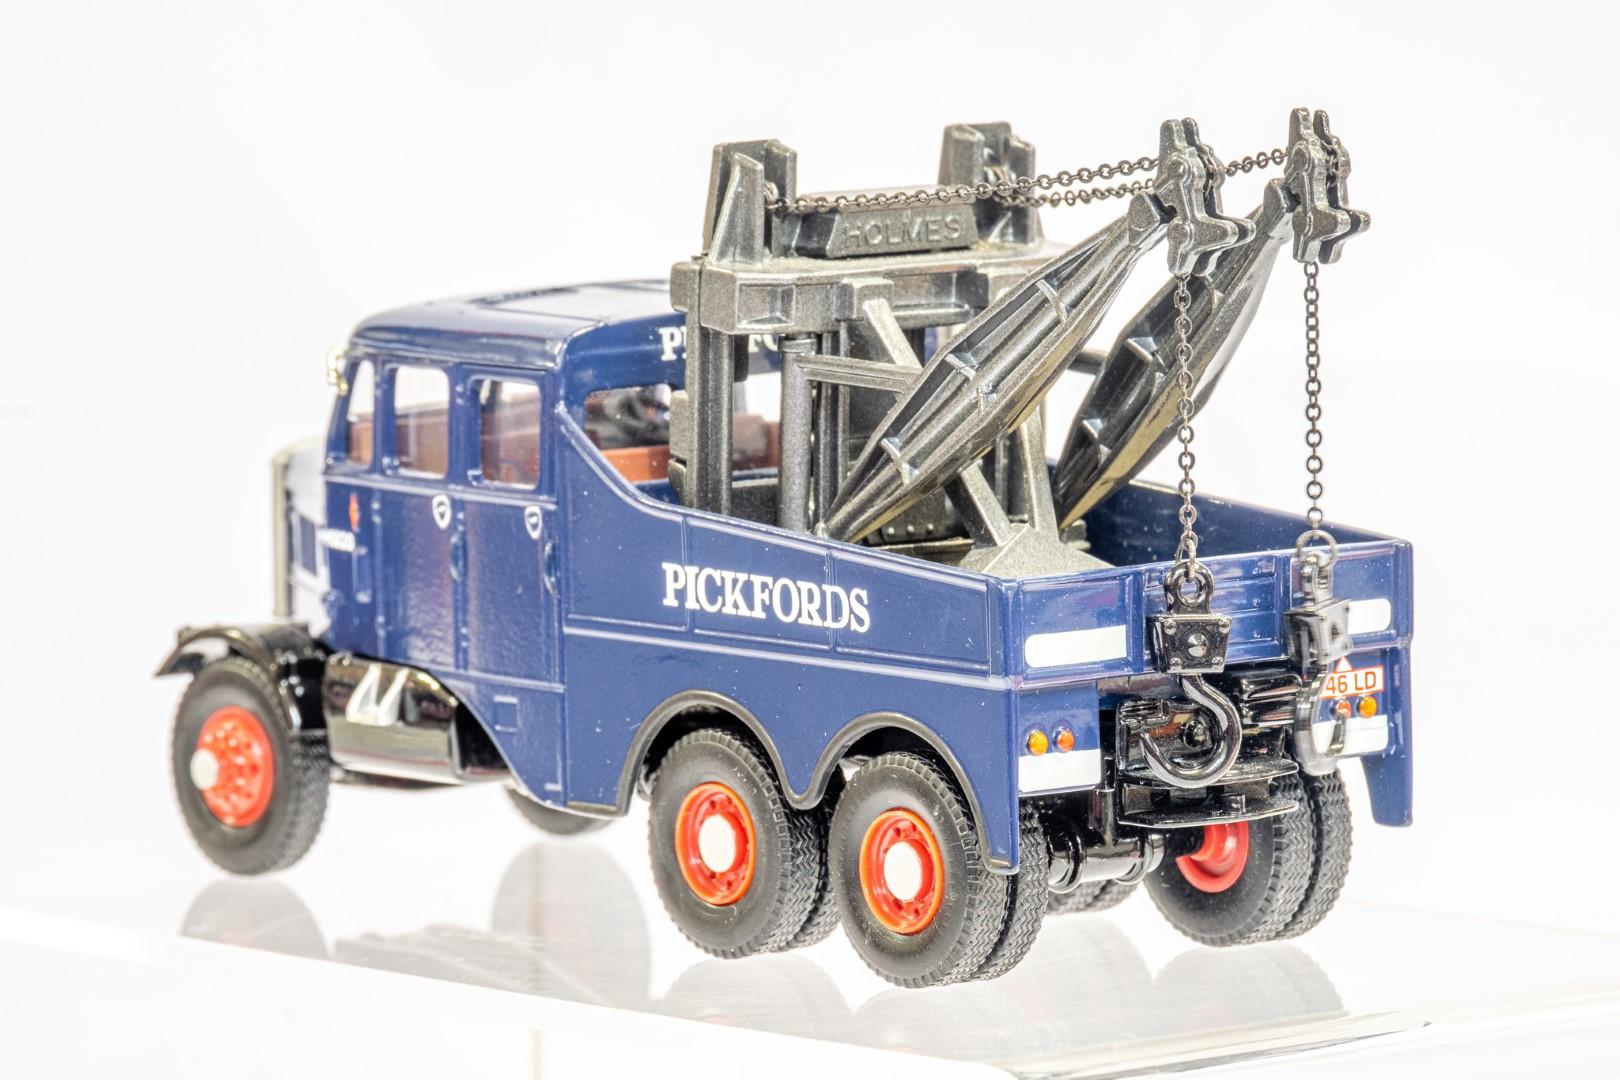 Corgi Pickfords Scammell Constructor Wrecker - Image 6 of 8